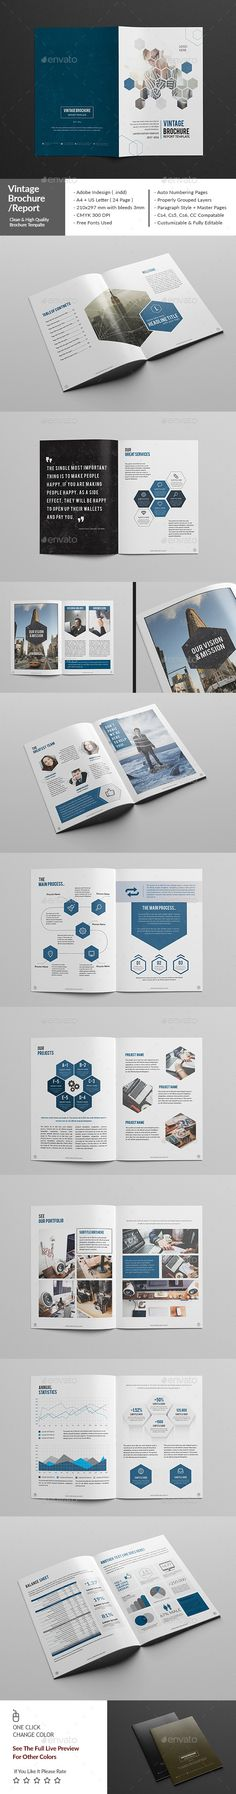 Vintage Corporate Brochure / Report Template InDesign INDD #design Download: http://graphicriver.net/item/vintage-corporate-brochurereport/14518138?ref=ksioks